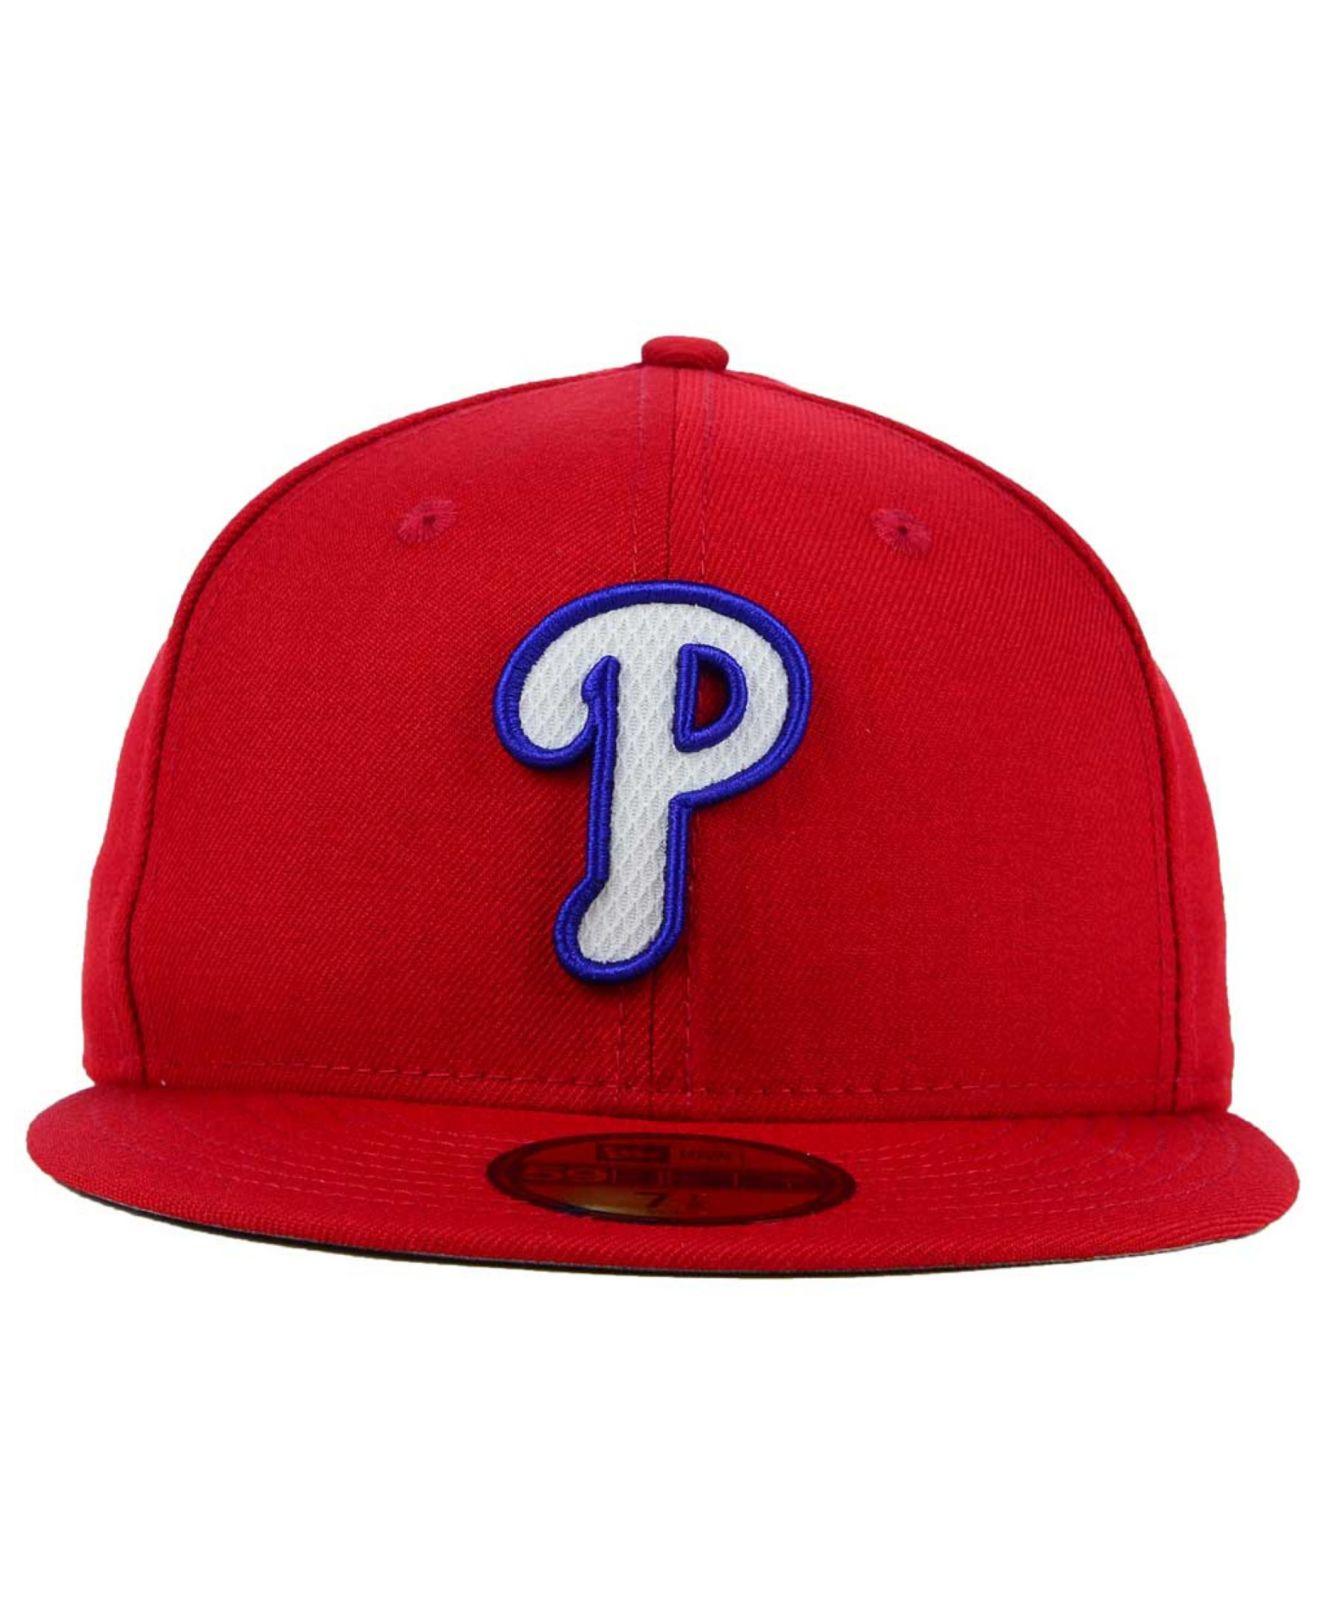 f7b9ce3a488 Lyst - KTZ Philadelphia Phillies Logo Lush 59fifty Cap in Red for Men